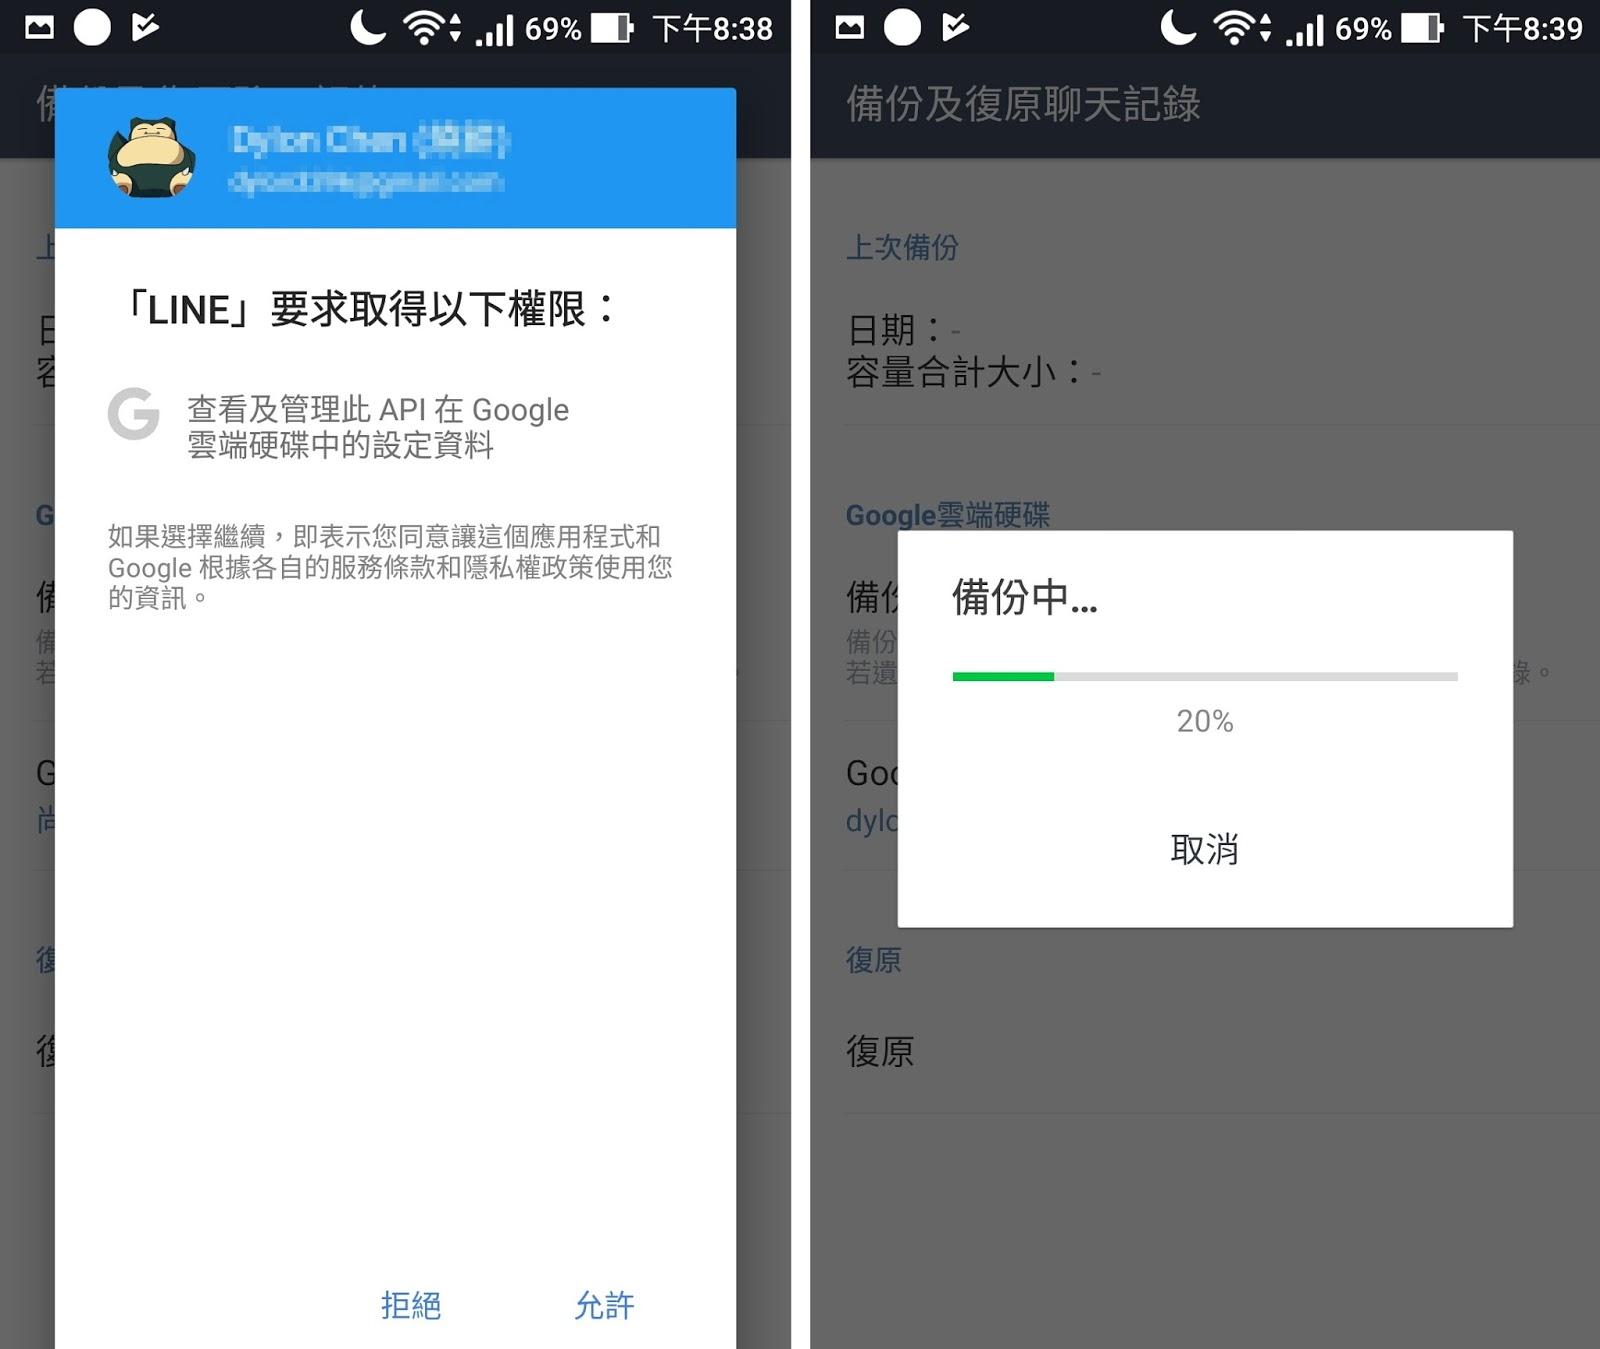 Screenshot 20170531 203848 - [教學] Line 終於開放 Android 使用者「雲端備份」聊天紀錄!趕快來更新吧!